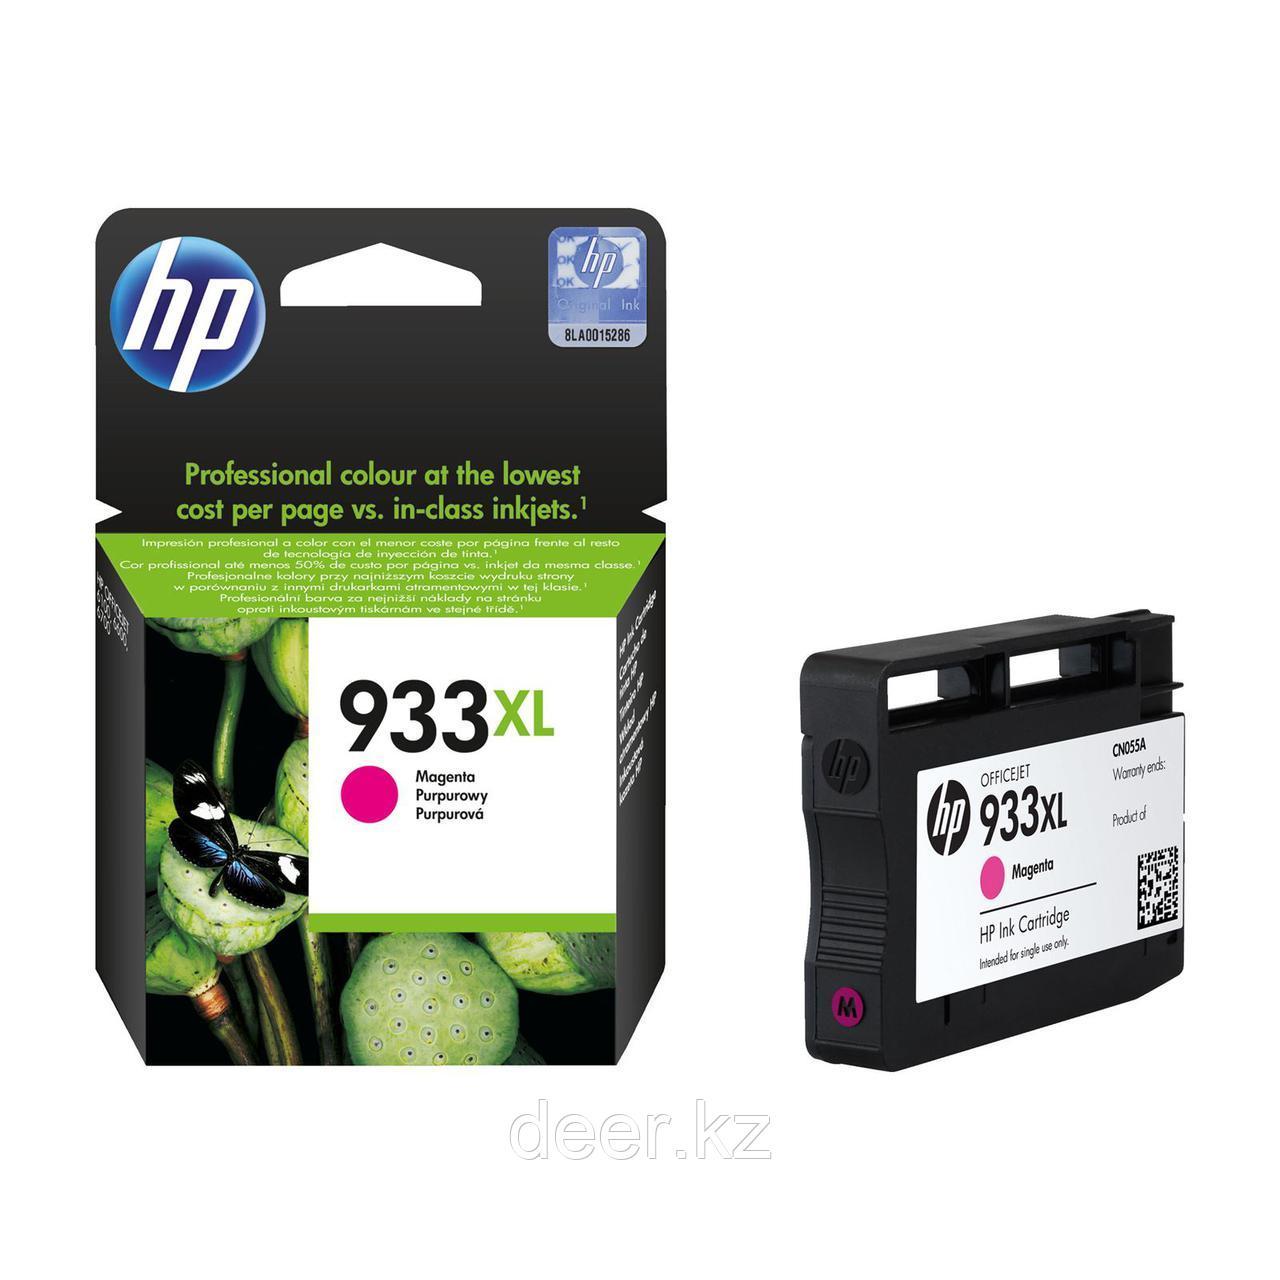 Картридж HP CN055AE#BGX Desk jet/№933/magenta/8,5 ml